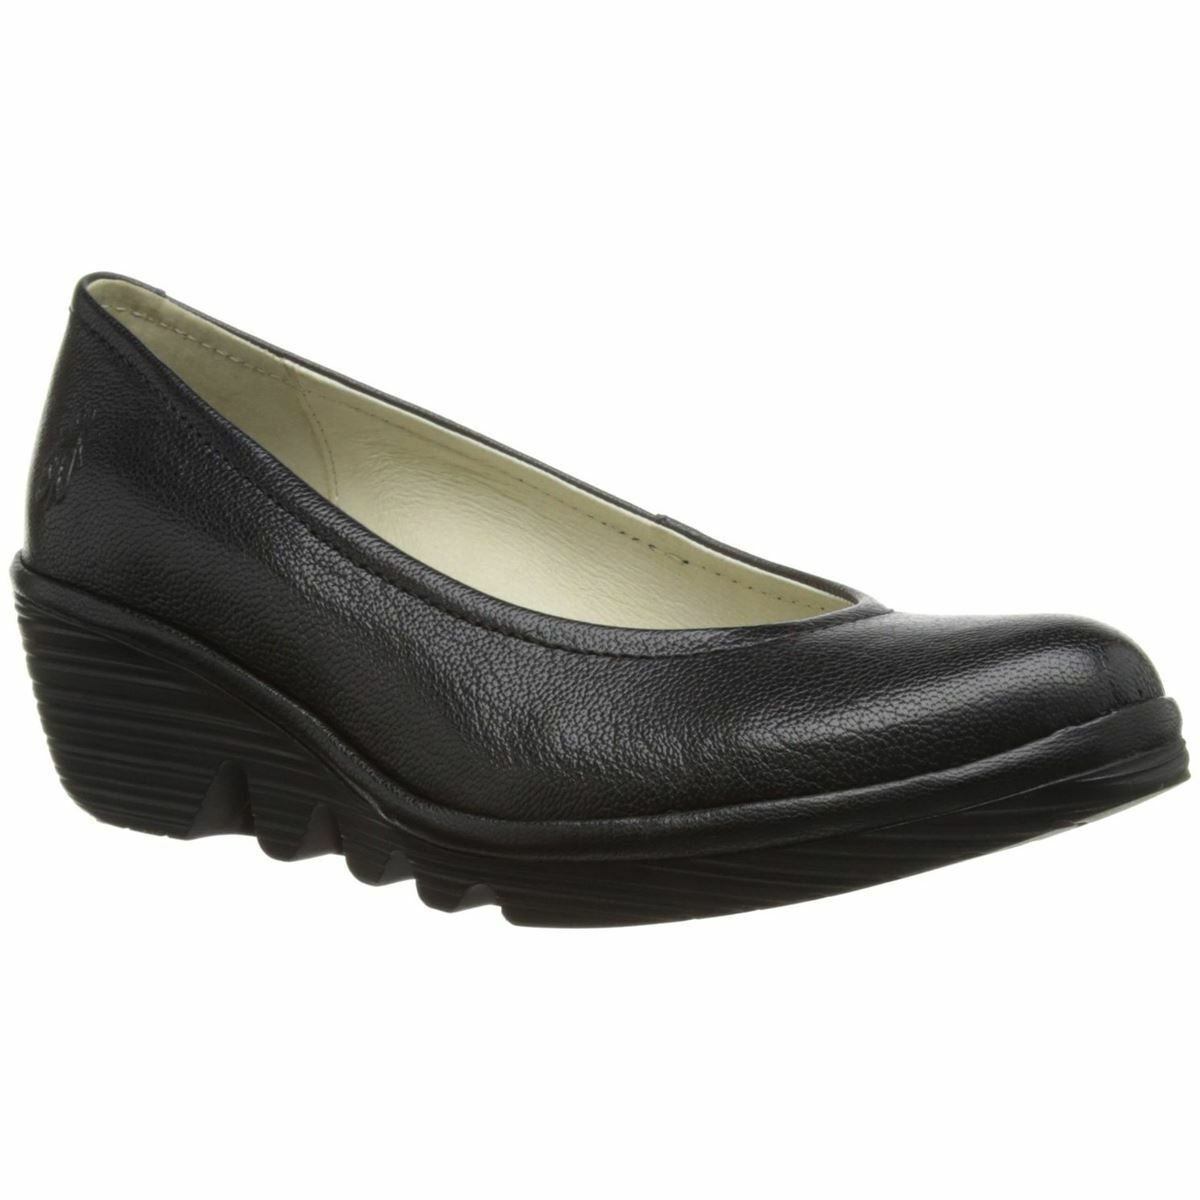 Fly London Pump Black Womens shoes